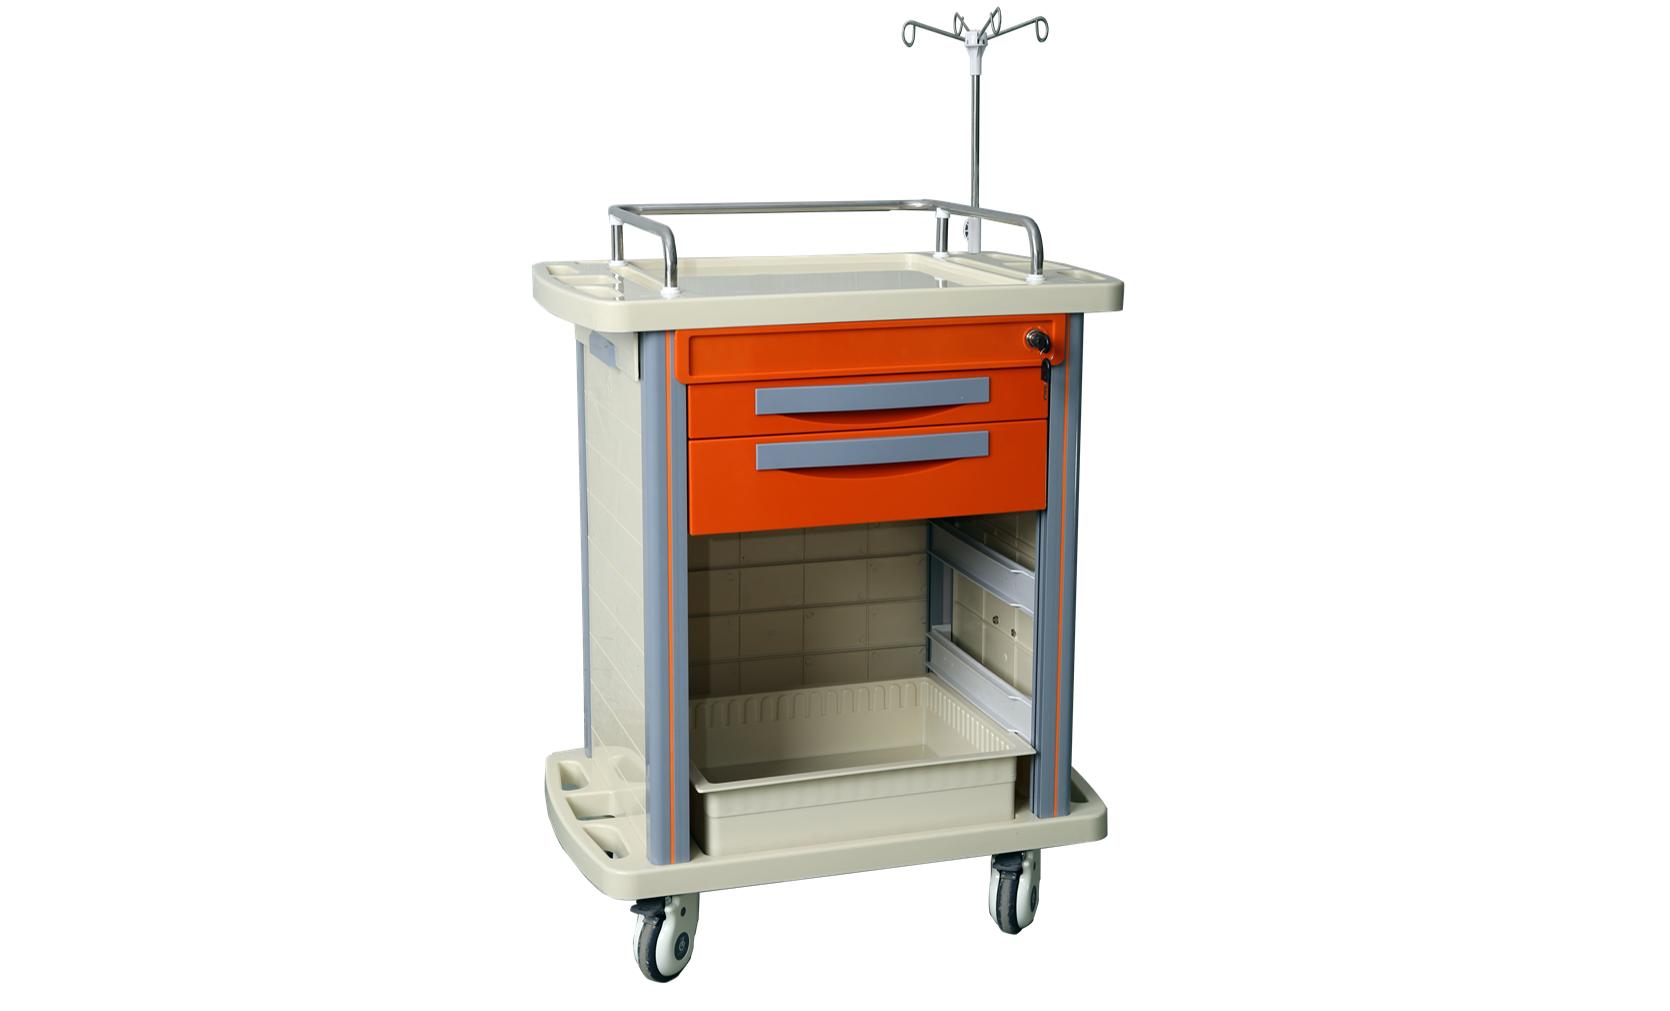 DW-TT009 ABS Treatment trolley